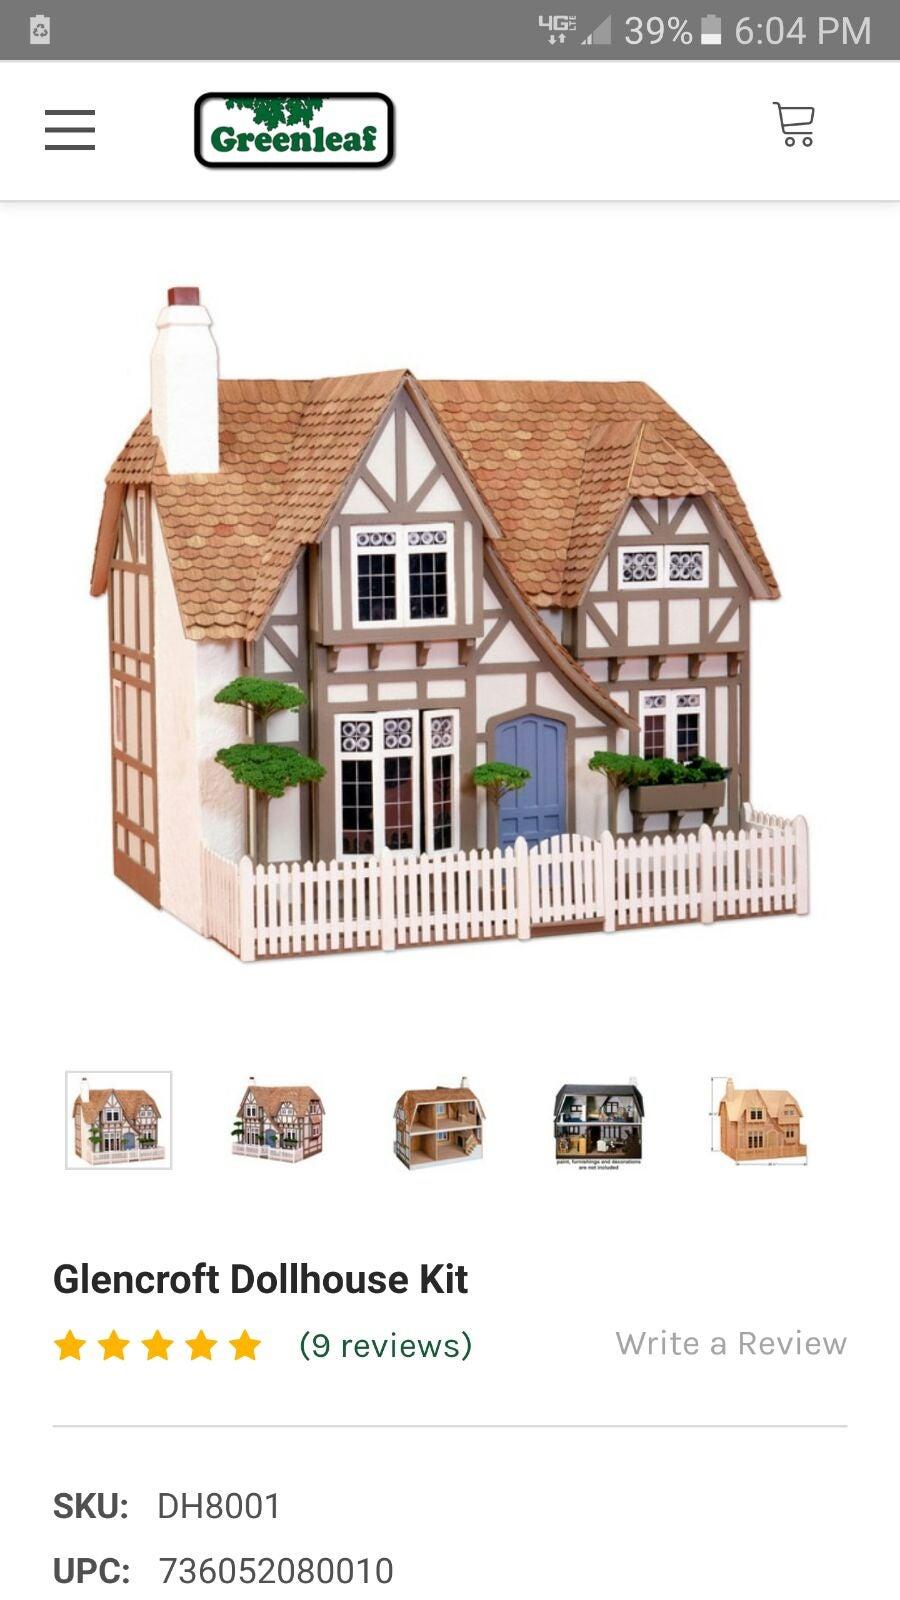 The Glencroft Wooden dollhouse kit